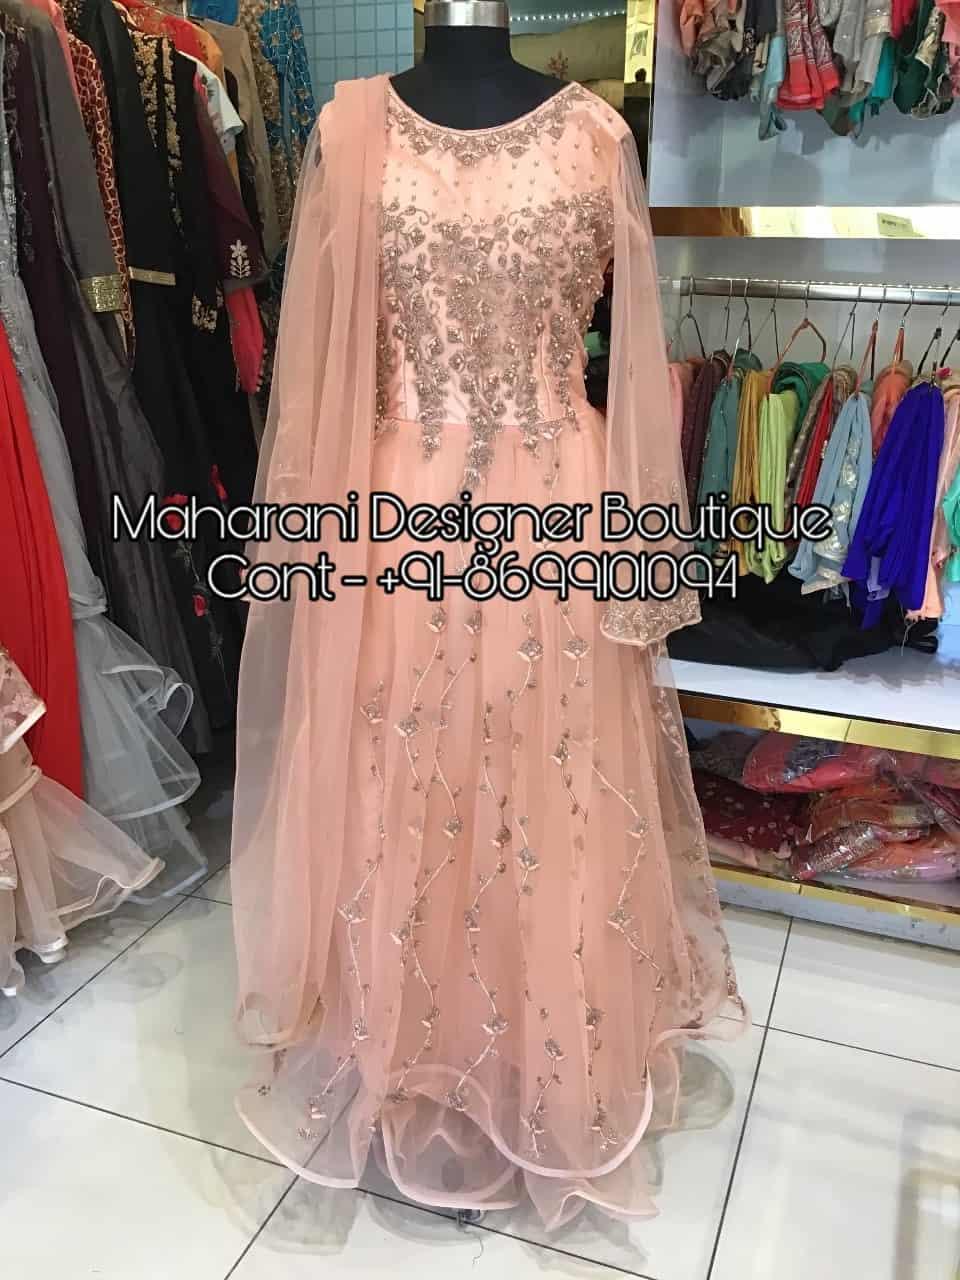 Party Wear Dresses On Rent In Jalandhar Cantt Maharani Designer Boutique,Casual Pakistani Wedding Guest Dresses 2020